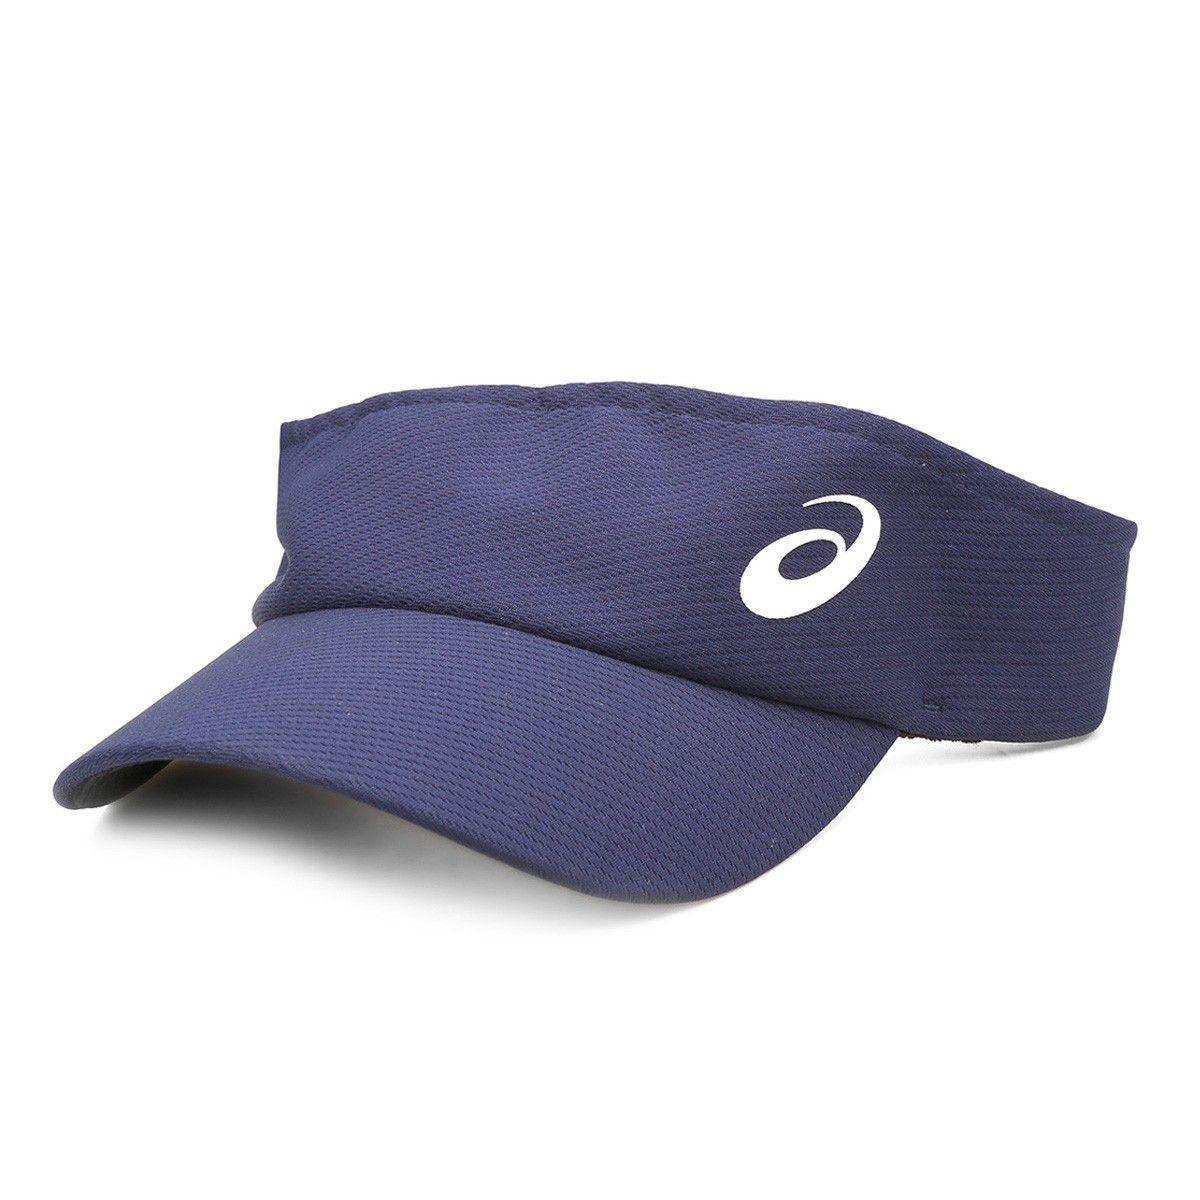 Viseira Asics Azul Marinho